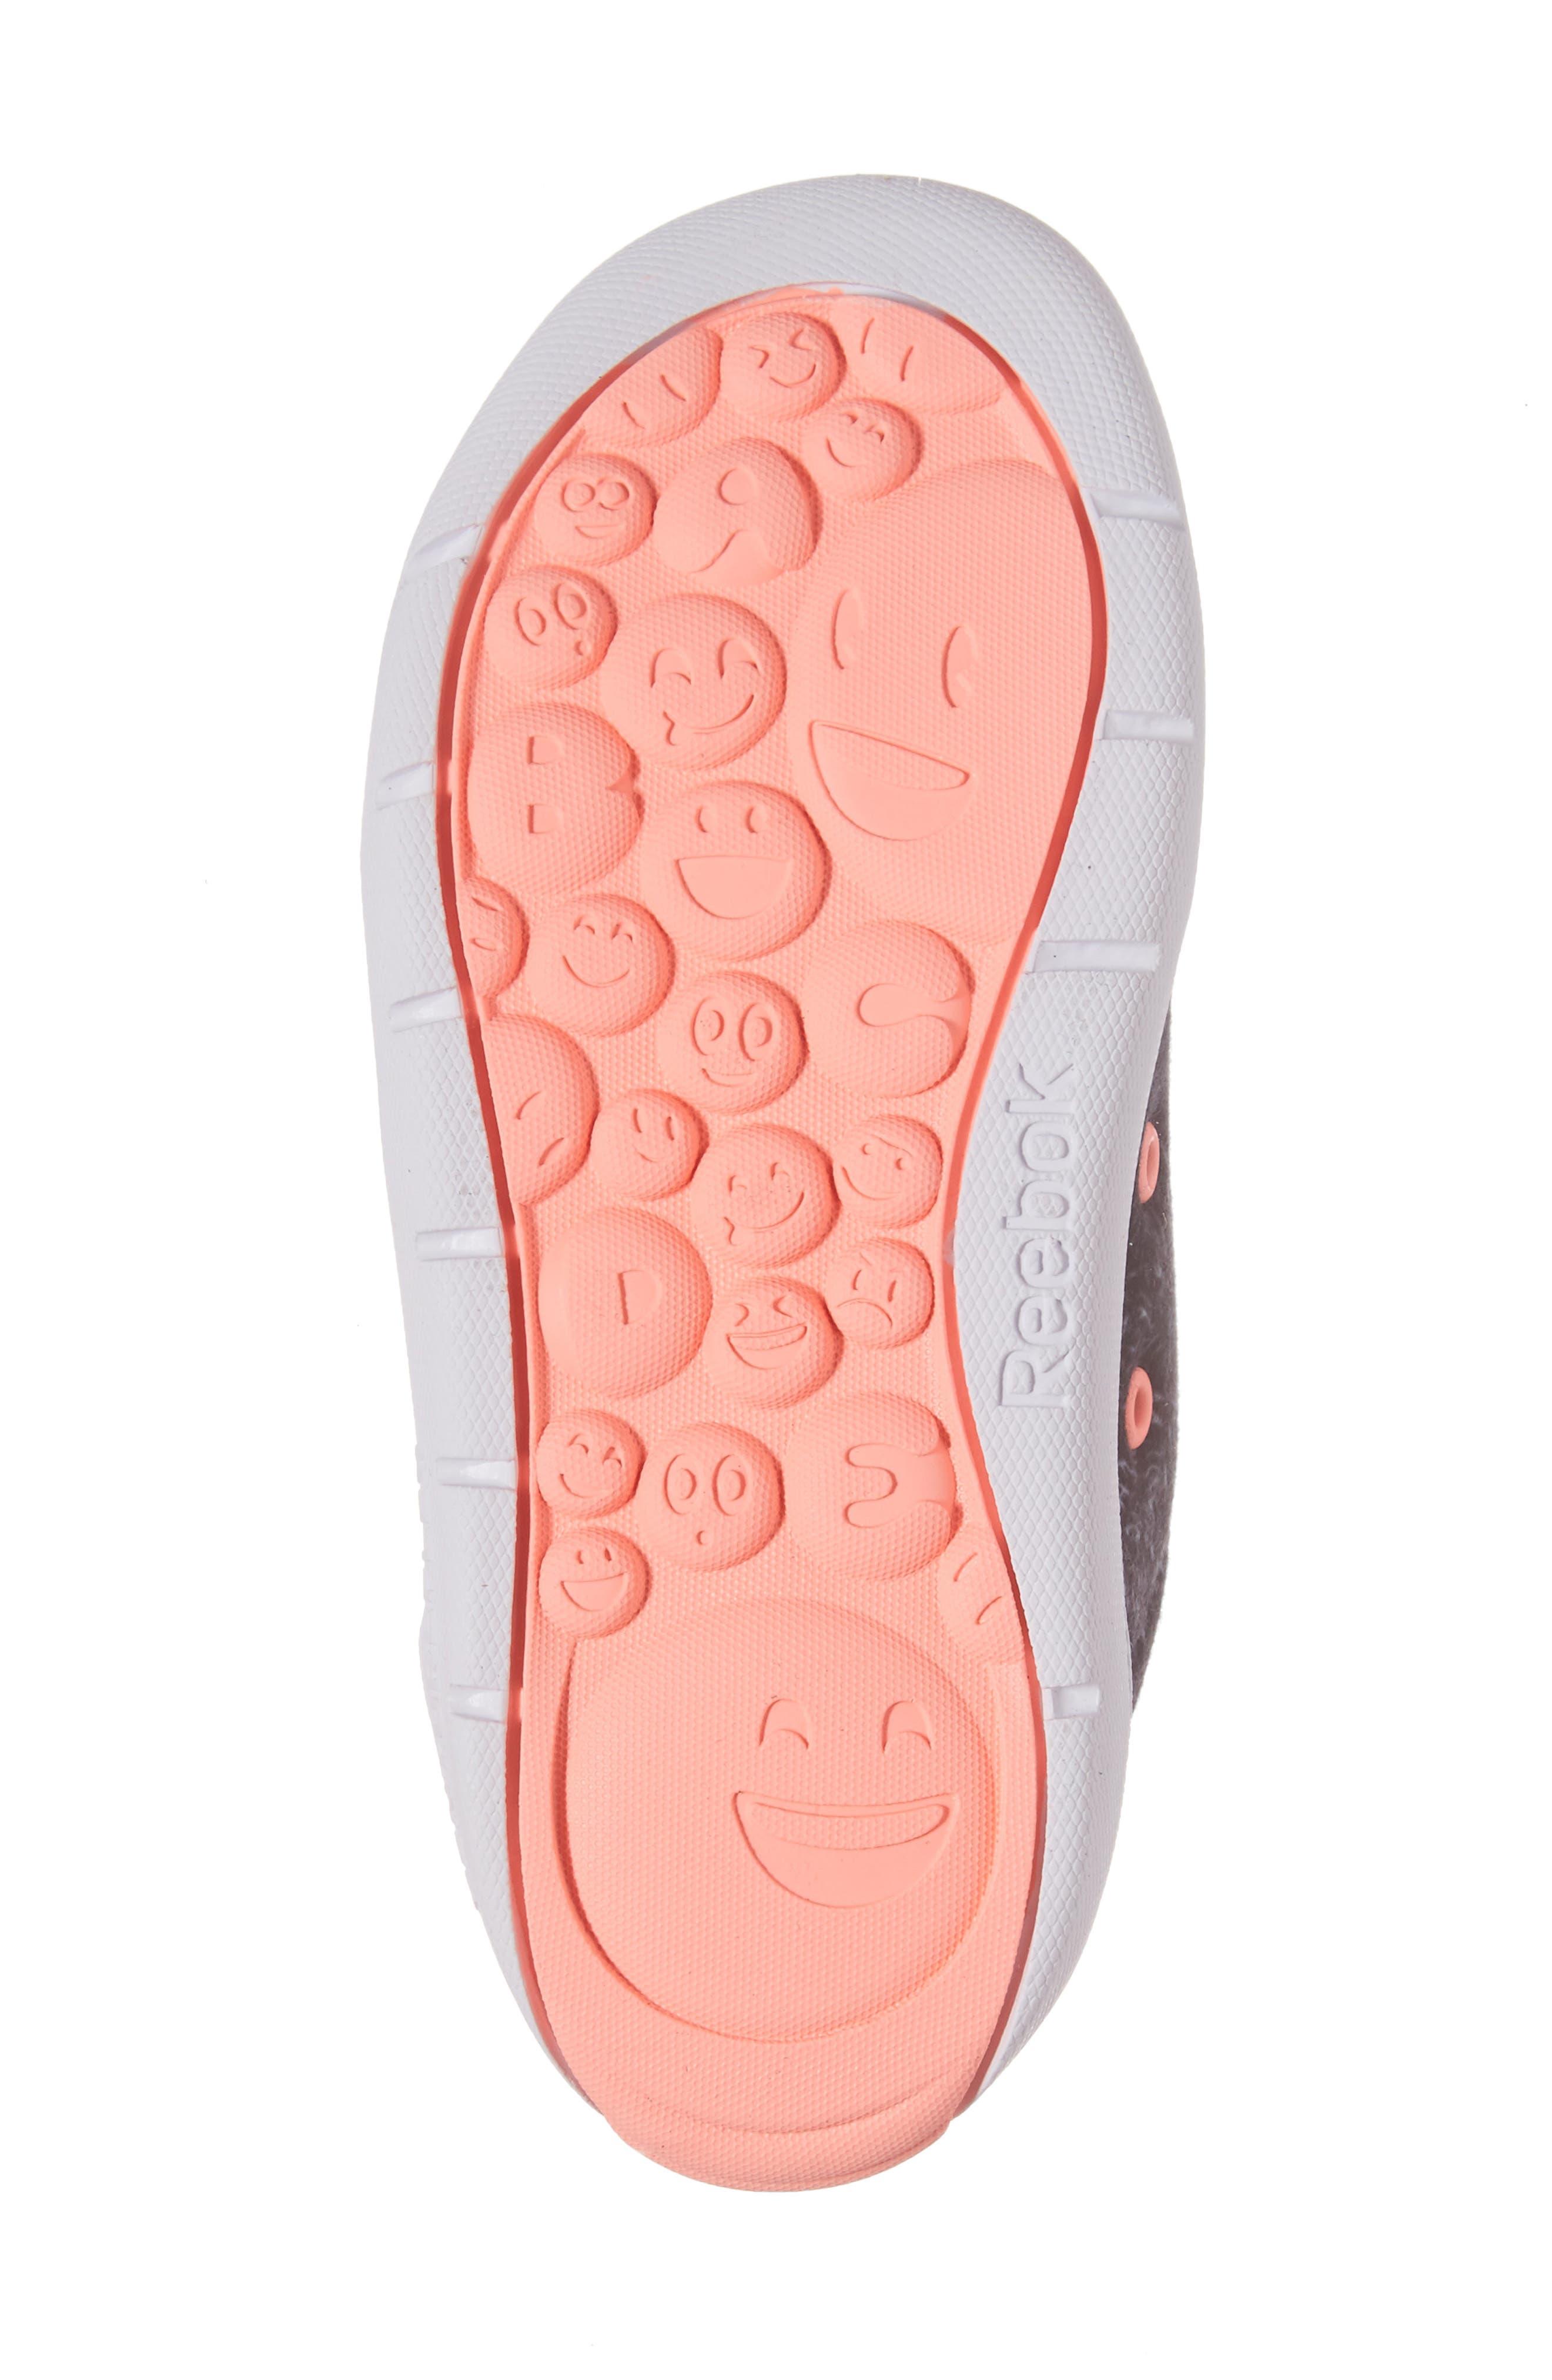 Ventureflex Critter Feet Sneaker,                             Alternate thumbnail 6, color,                             Artic Black/ White/ Sour Melon